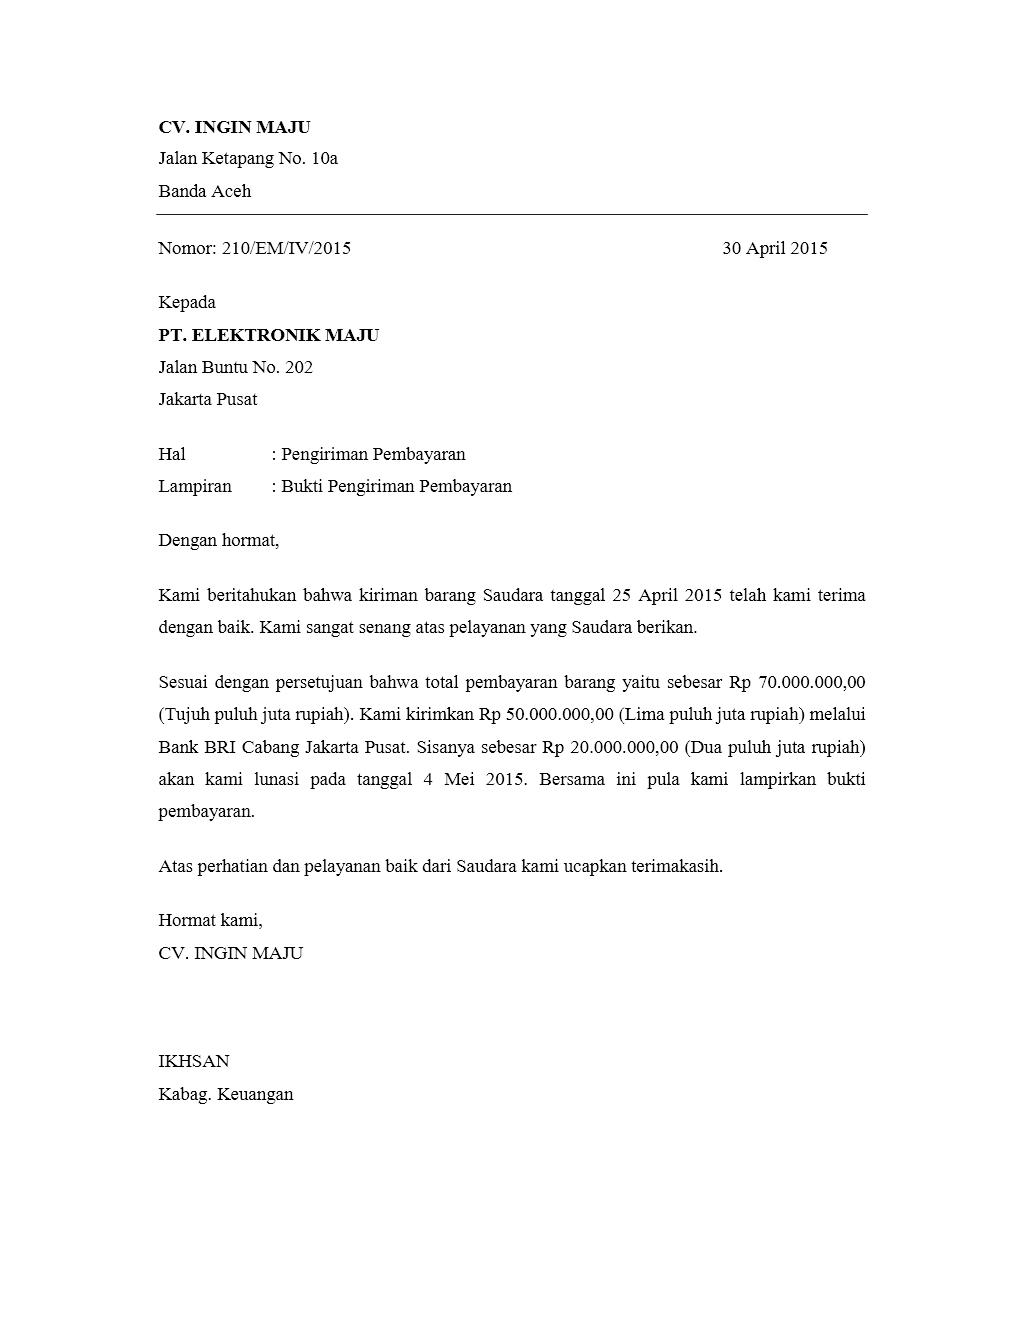 Kumpulan contoh surat pengiriman pembayaran yang benar contoh contoh surat pengiriman pembayaran thecheapjerseys Gallery